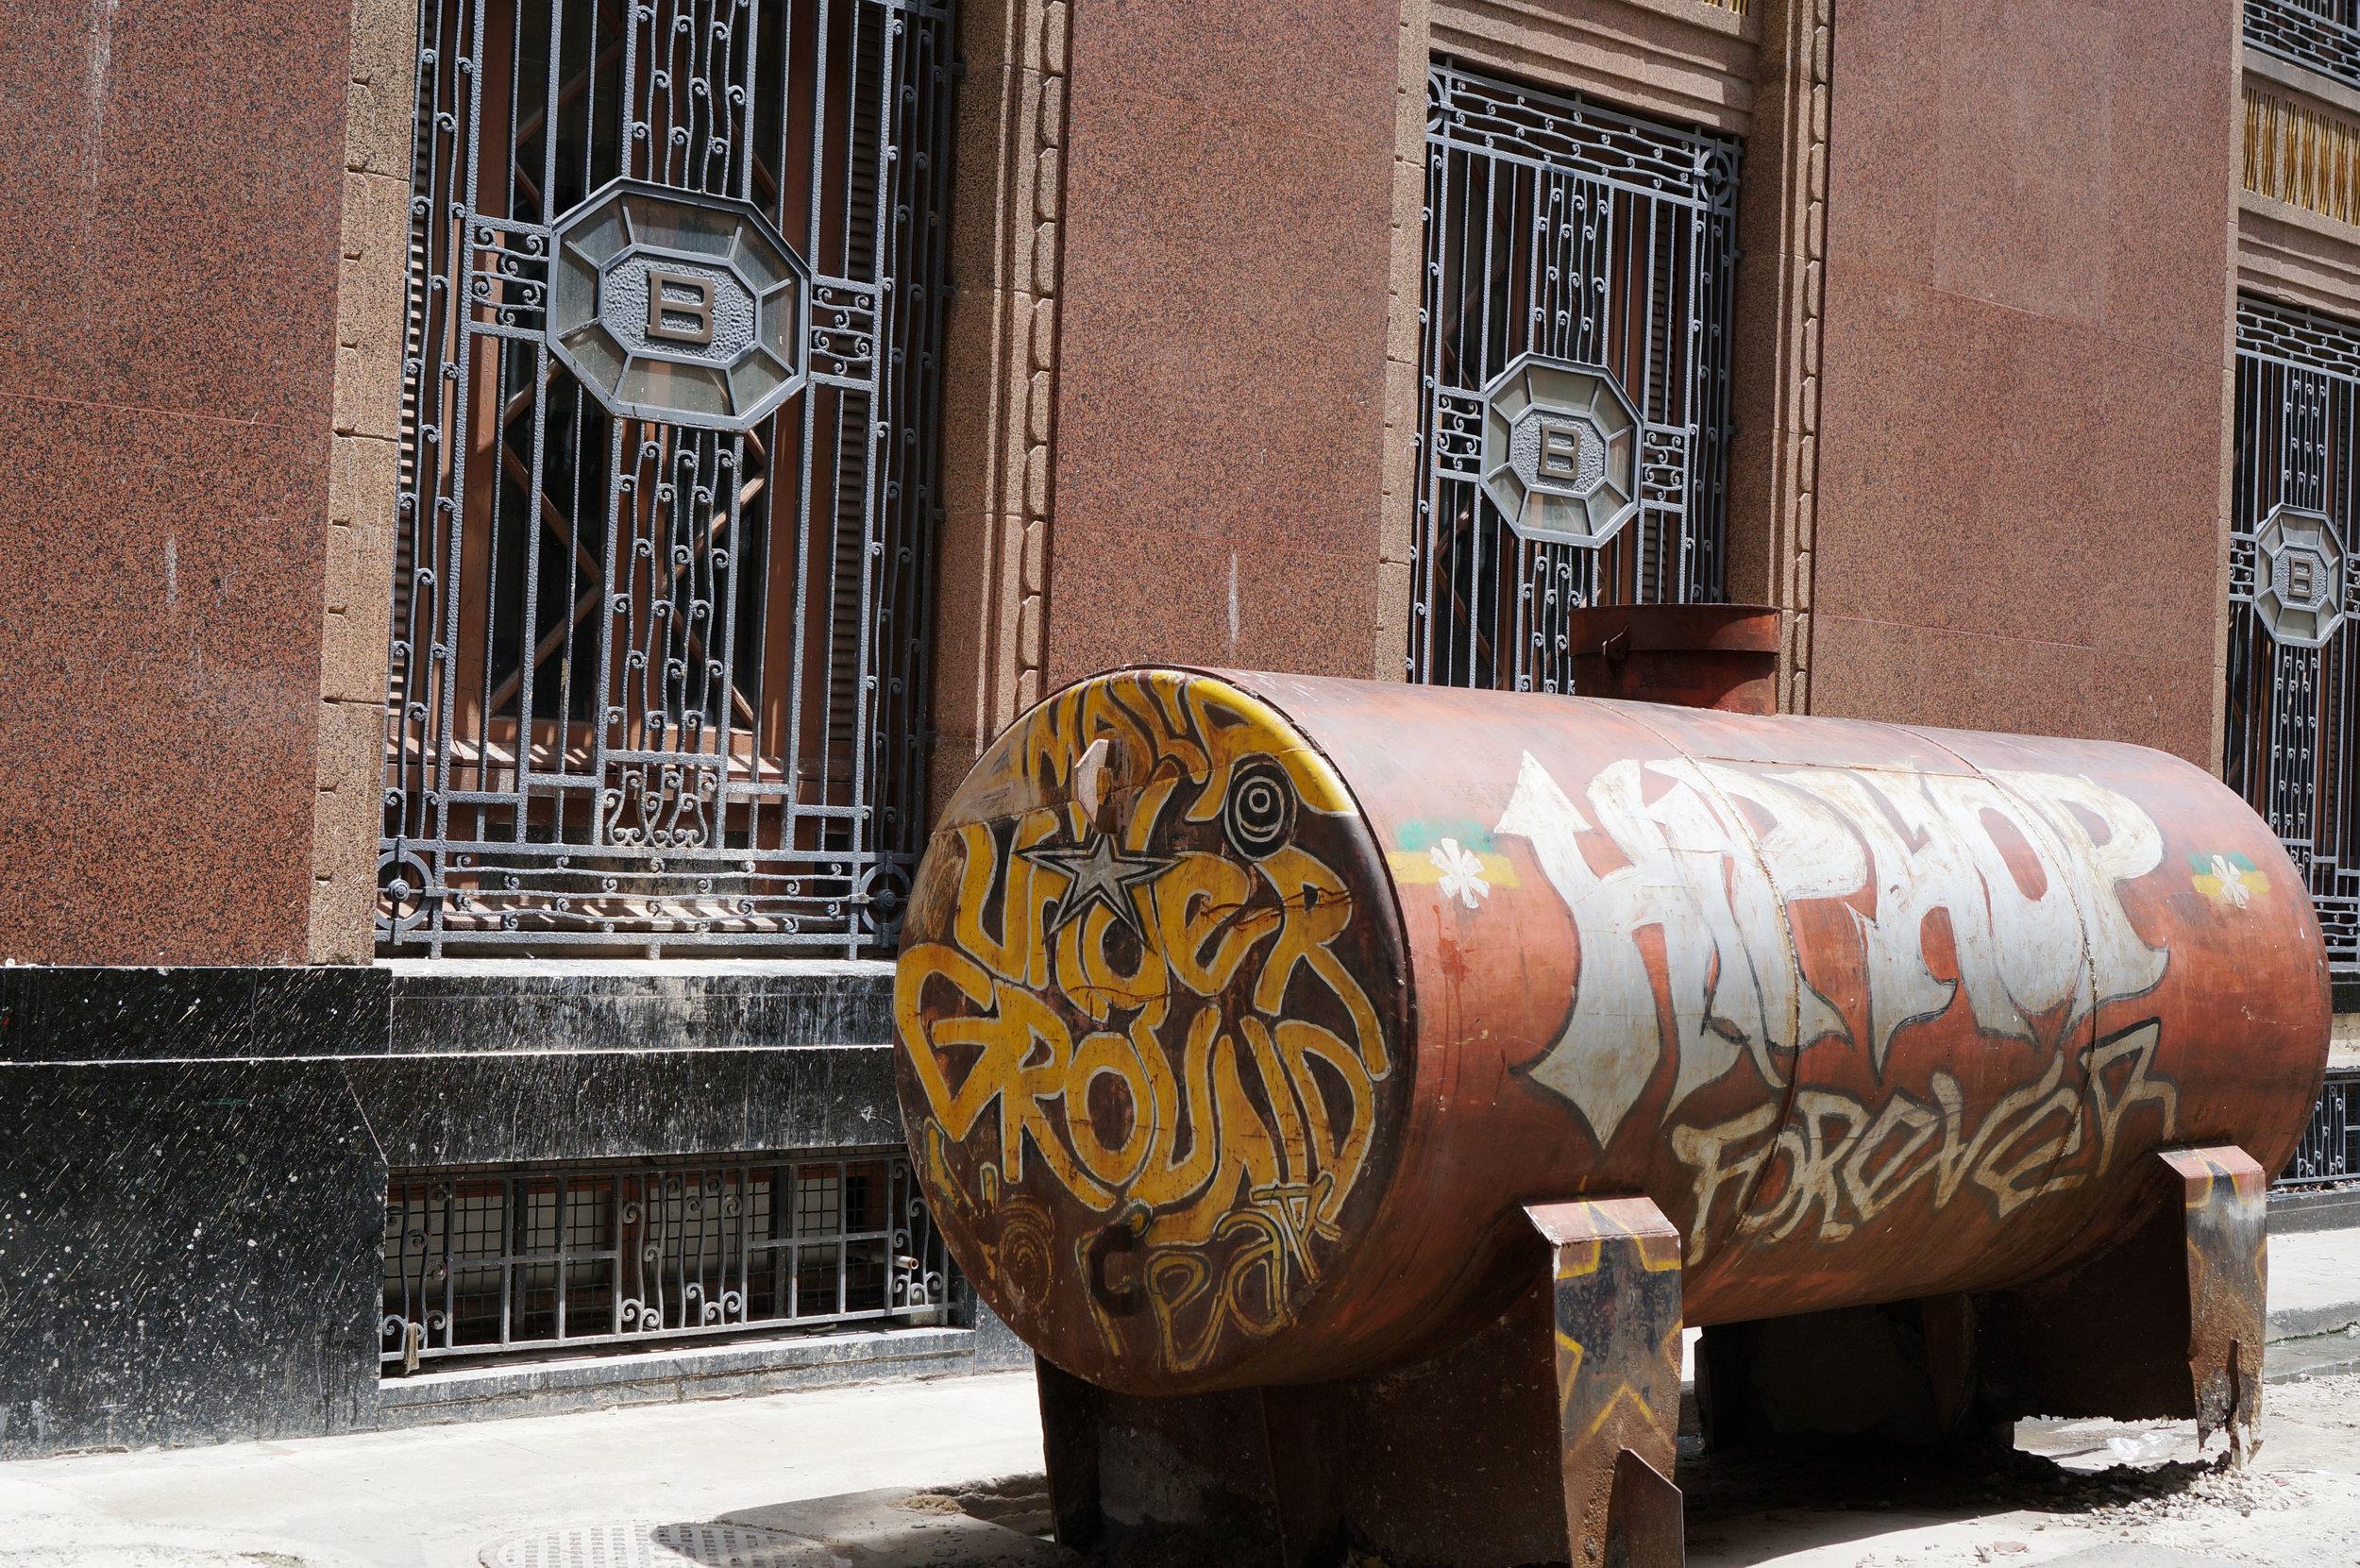 """Hip Hop Forever - Under Ground"" seen outside the BacardíBuilding"